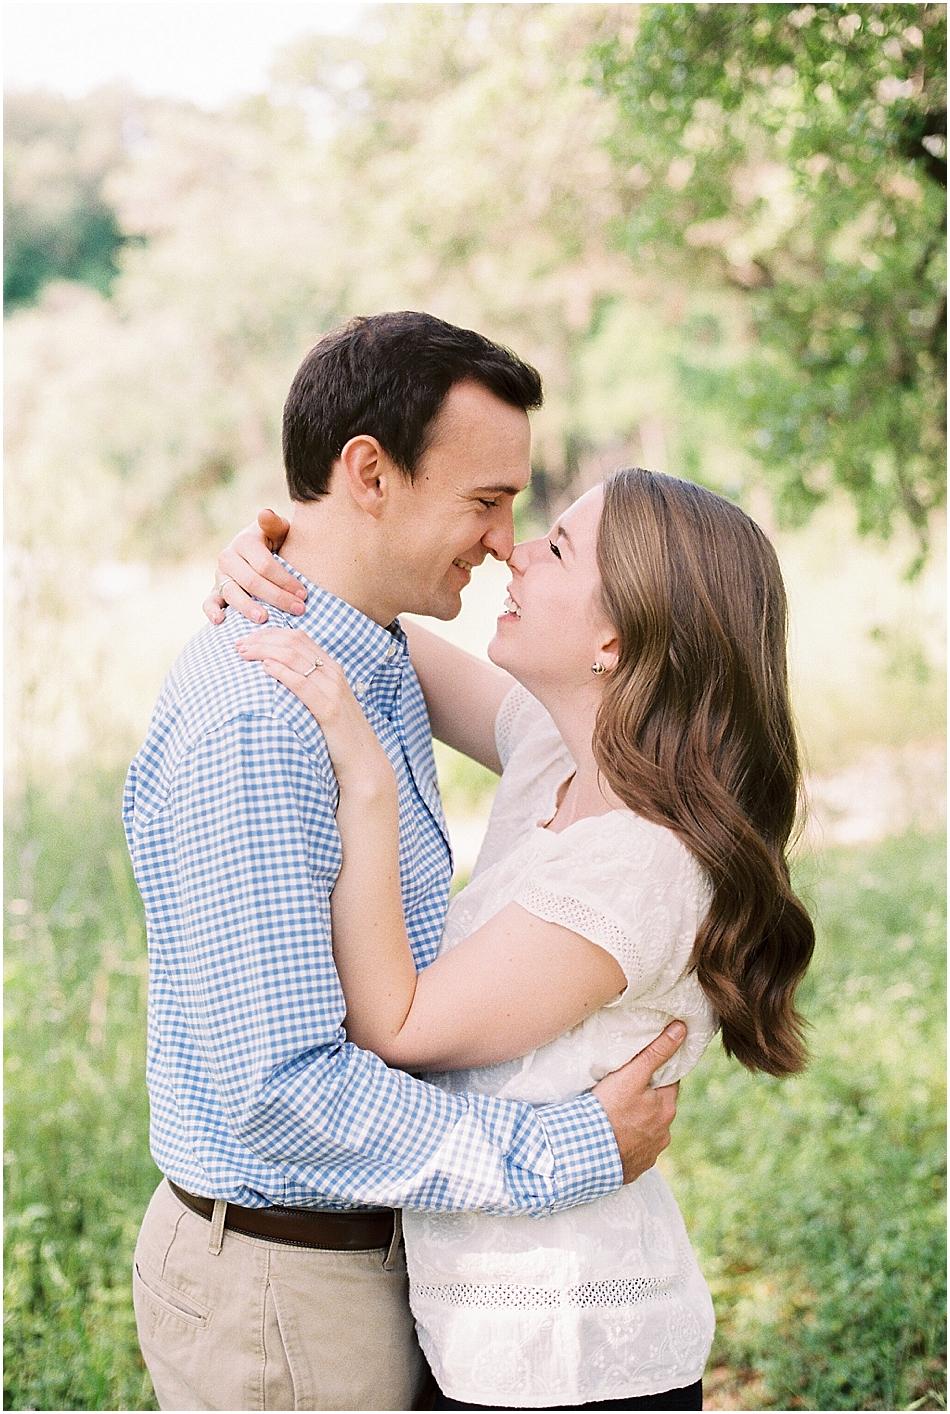 Laura + Nick | Engagement | Fine Art Film | Austin Texas | Emilie Anne Photography-24.jpg